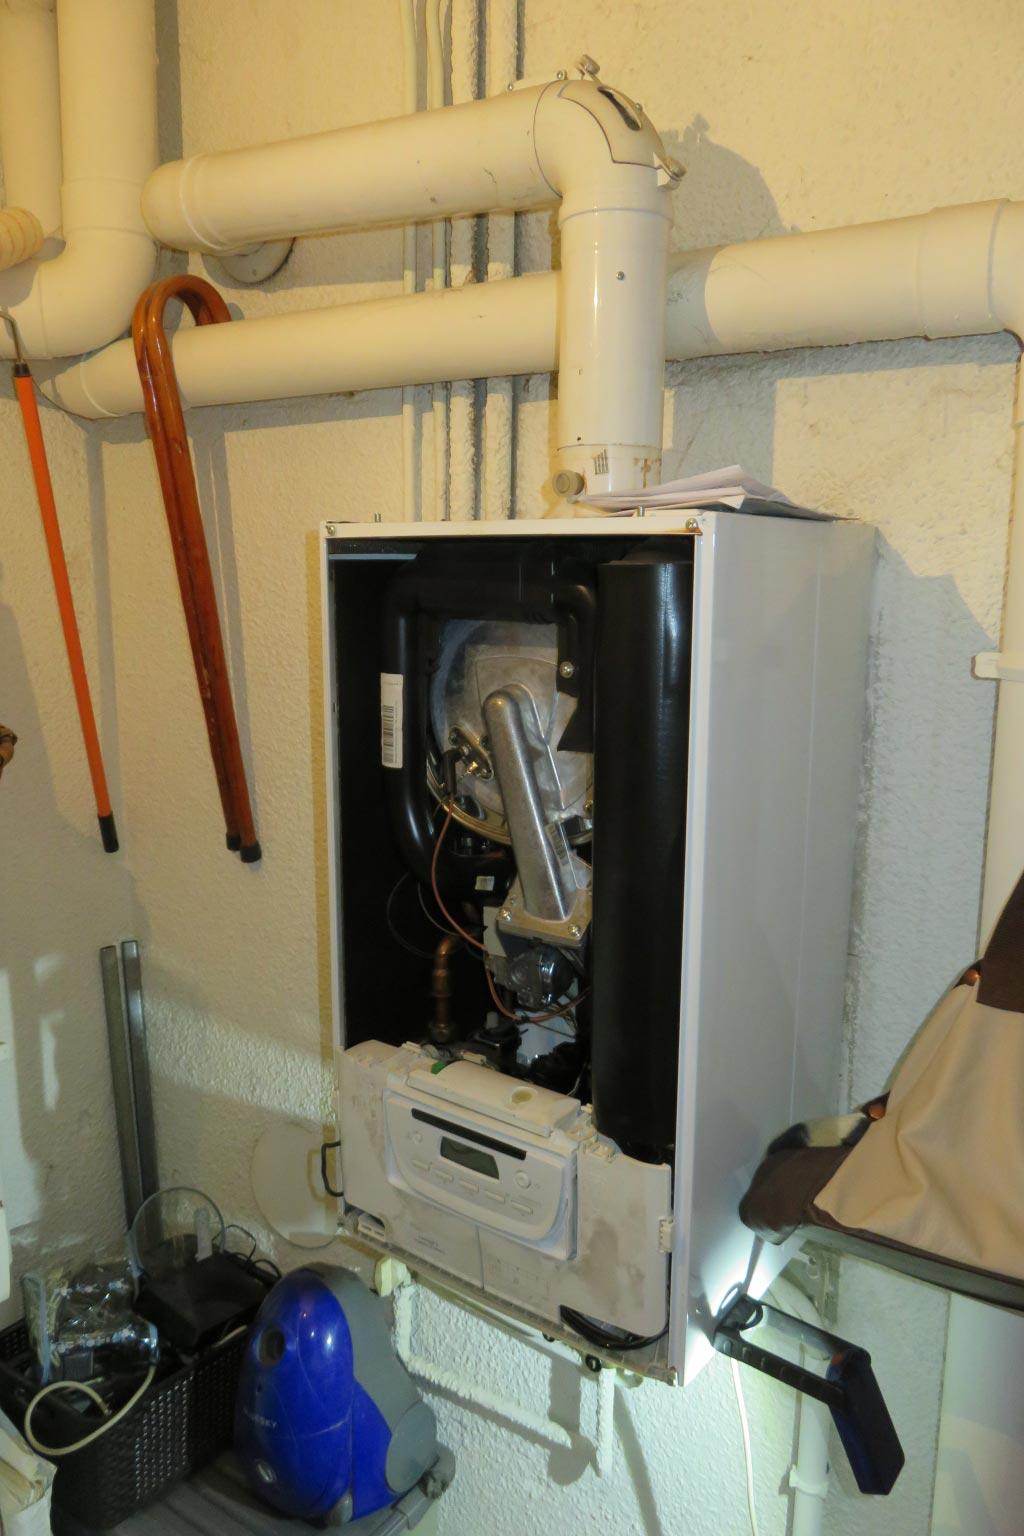 partenaire grdf installateur maintenance chaudi re gaz condensation nivolas vermelle. Black Bedroom Furniture Sets. Home Design Ideas